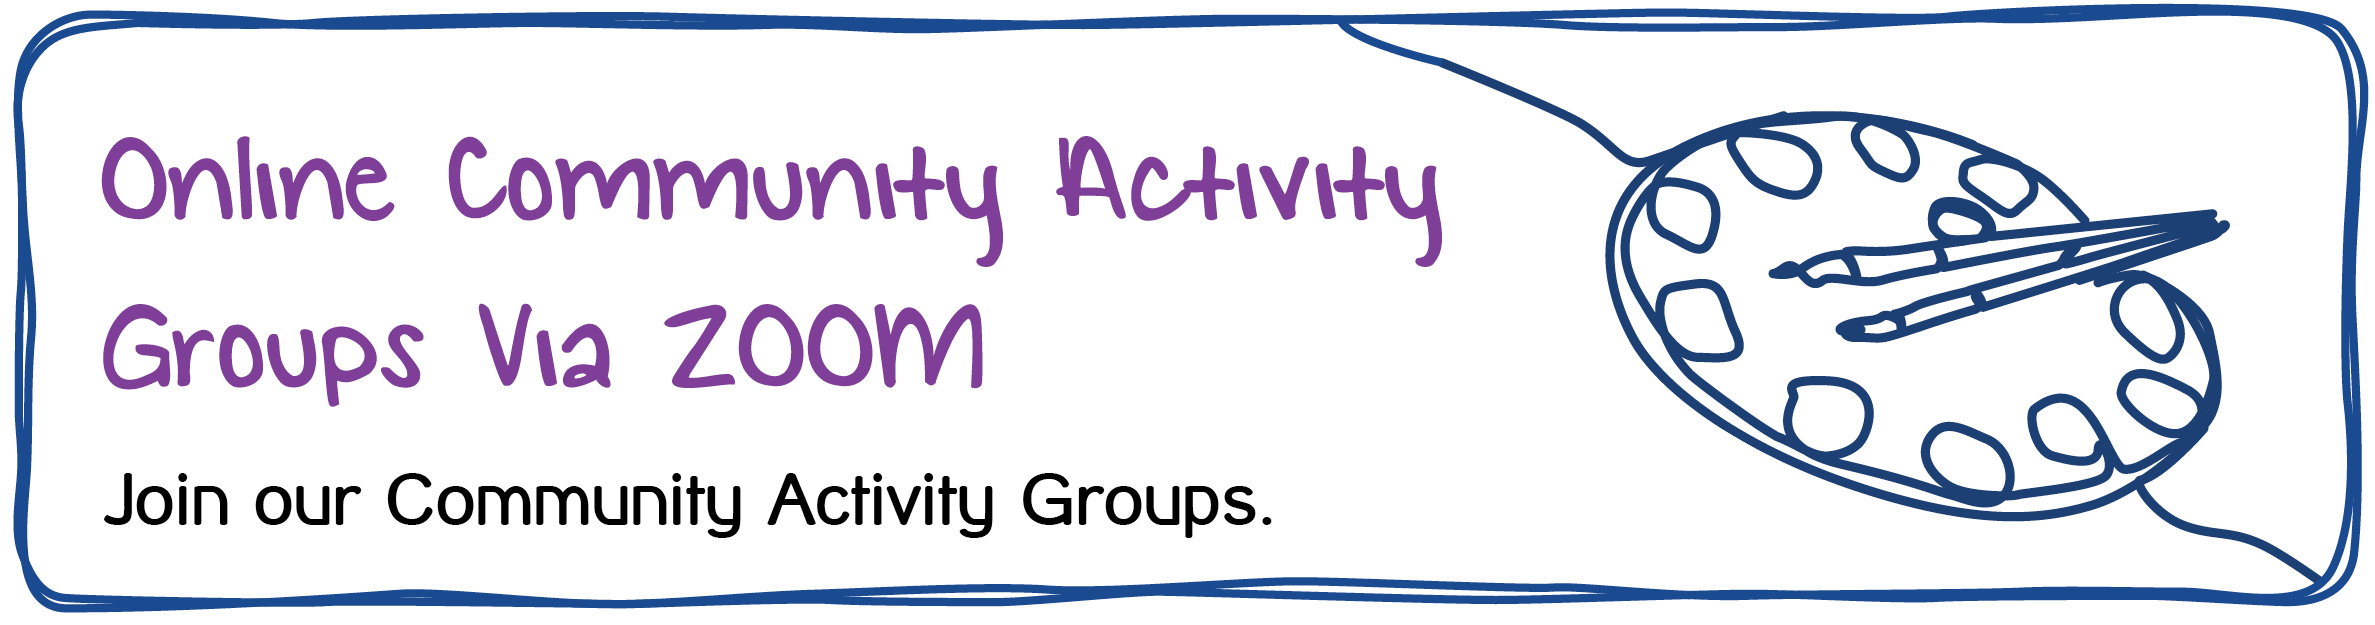 Online Community Activity Groups Via ZOOM Join our Community Activity Groups.